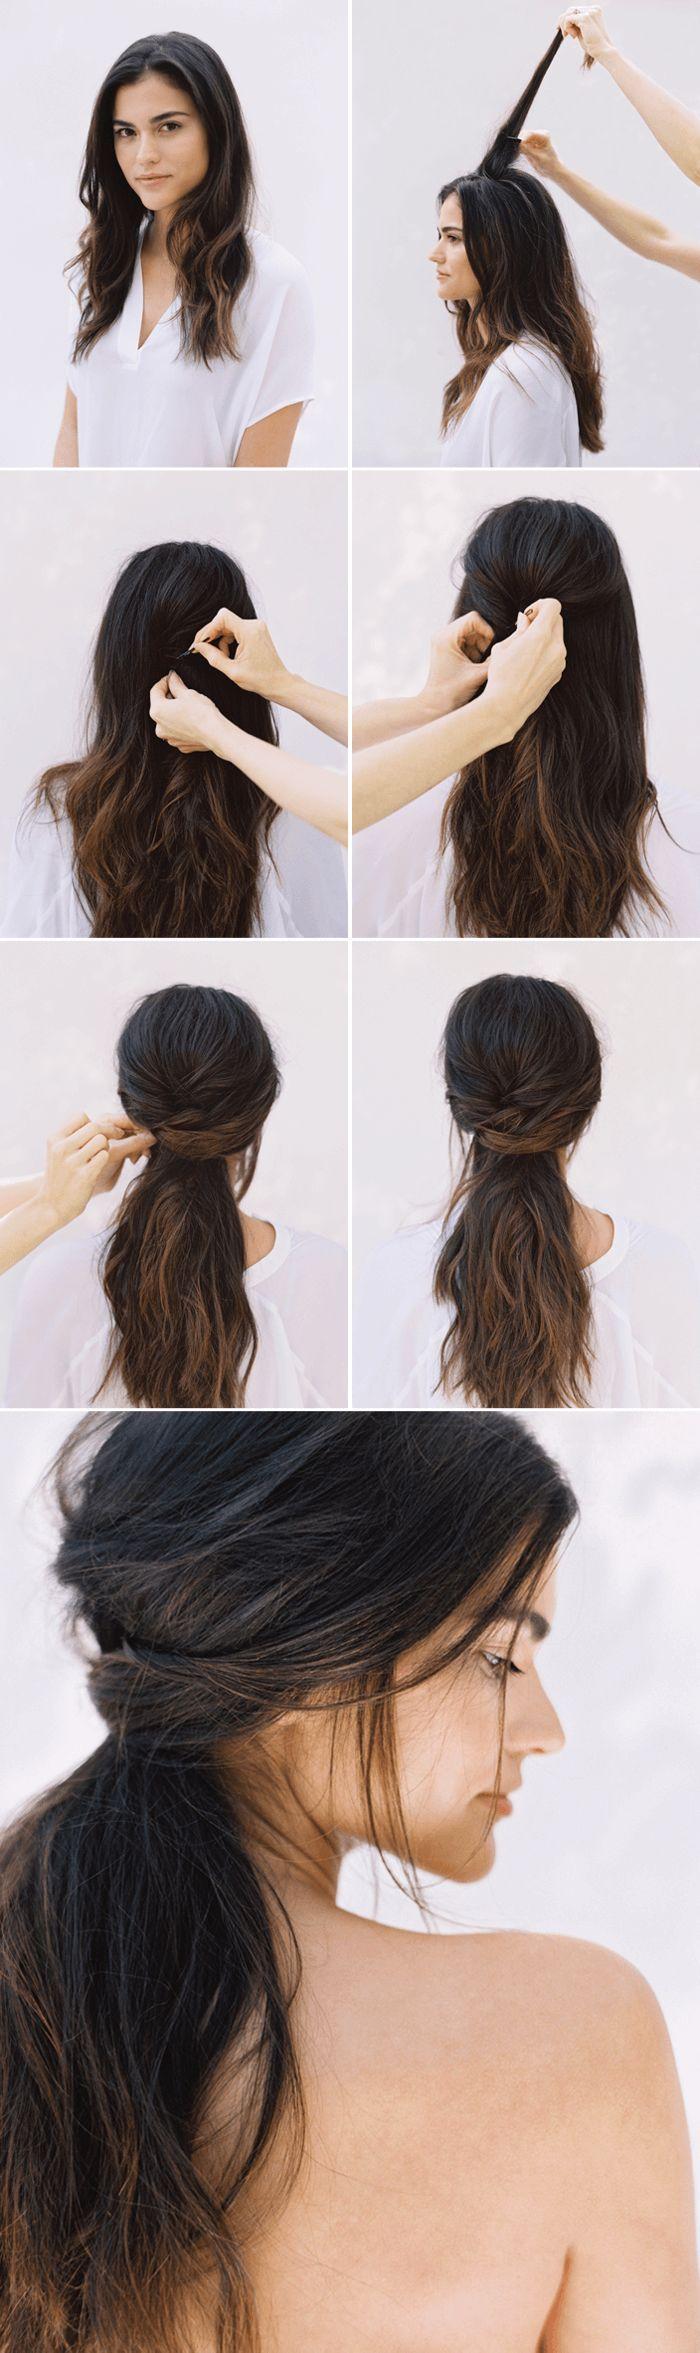 27 Gorgeous half-up half-down hairstyles